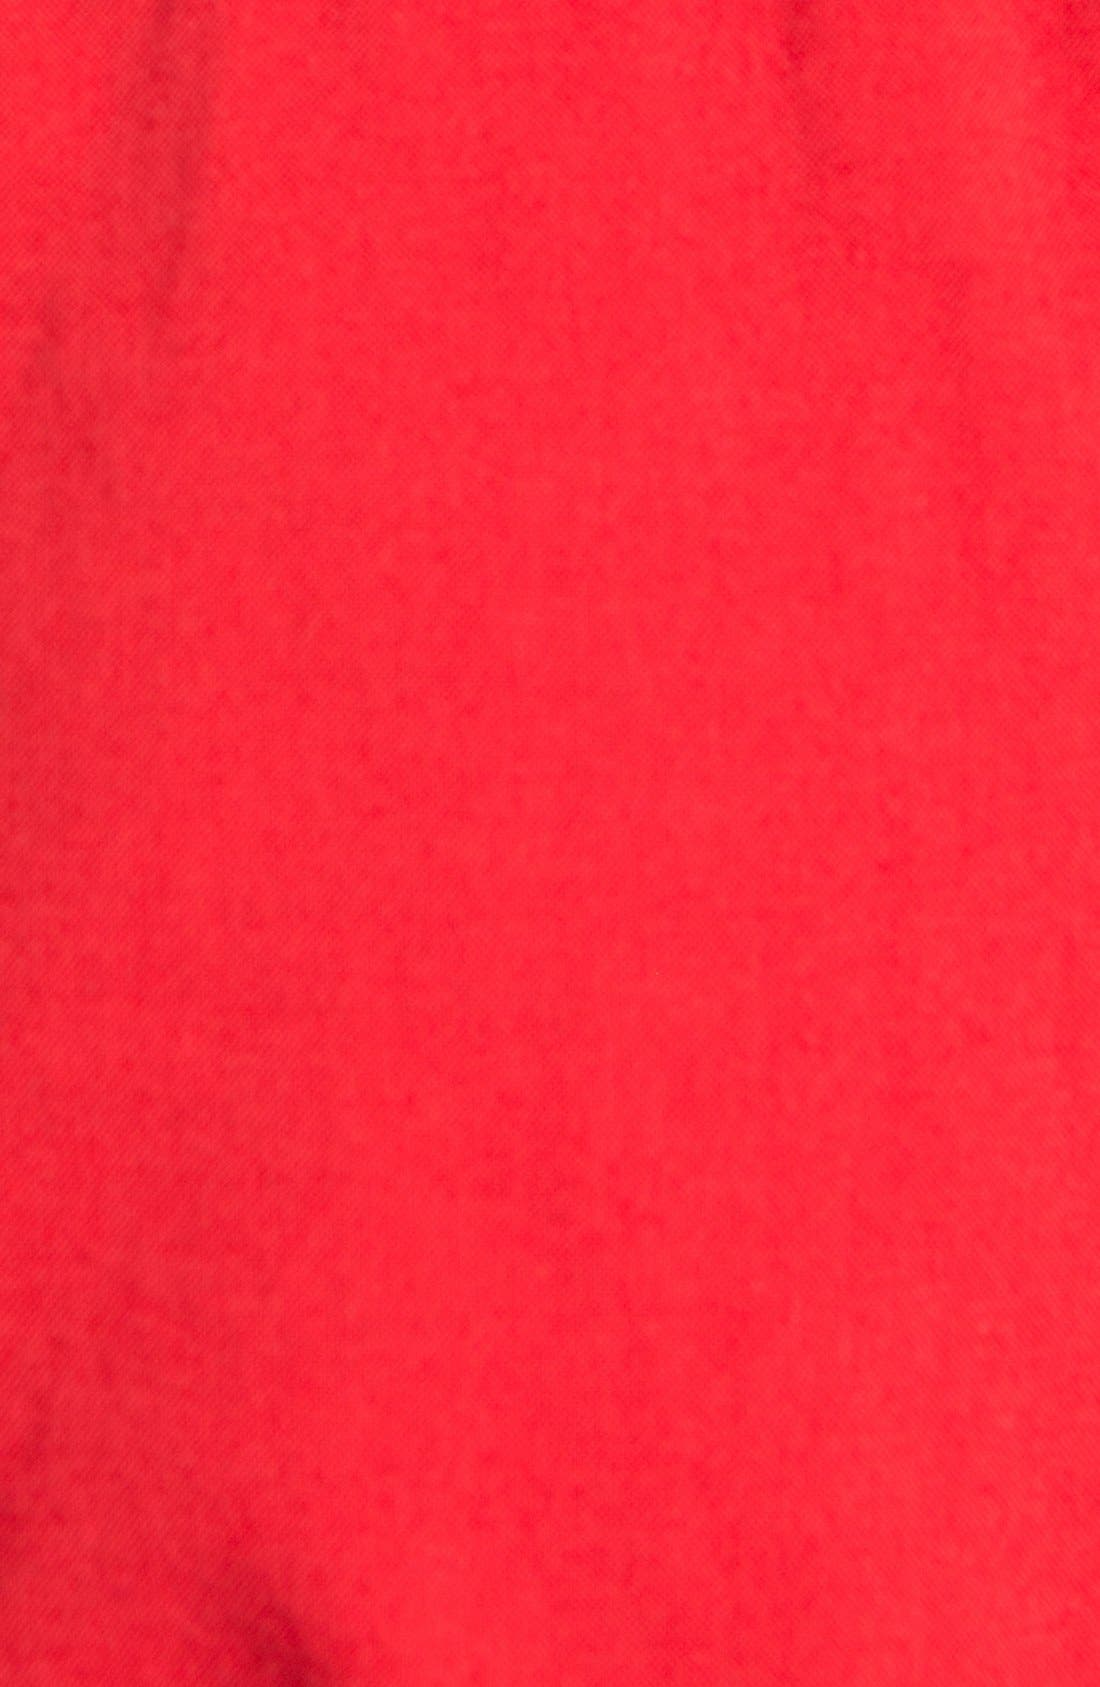 Alternate Image 3  - Band of Outsiders 'Batiste' Cotton Shirt